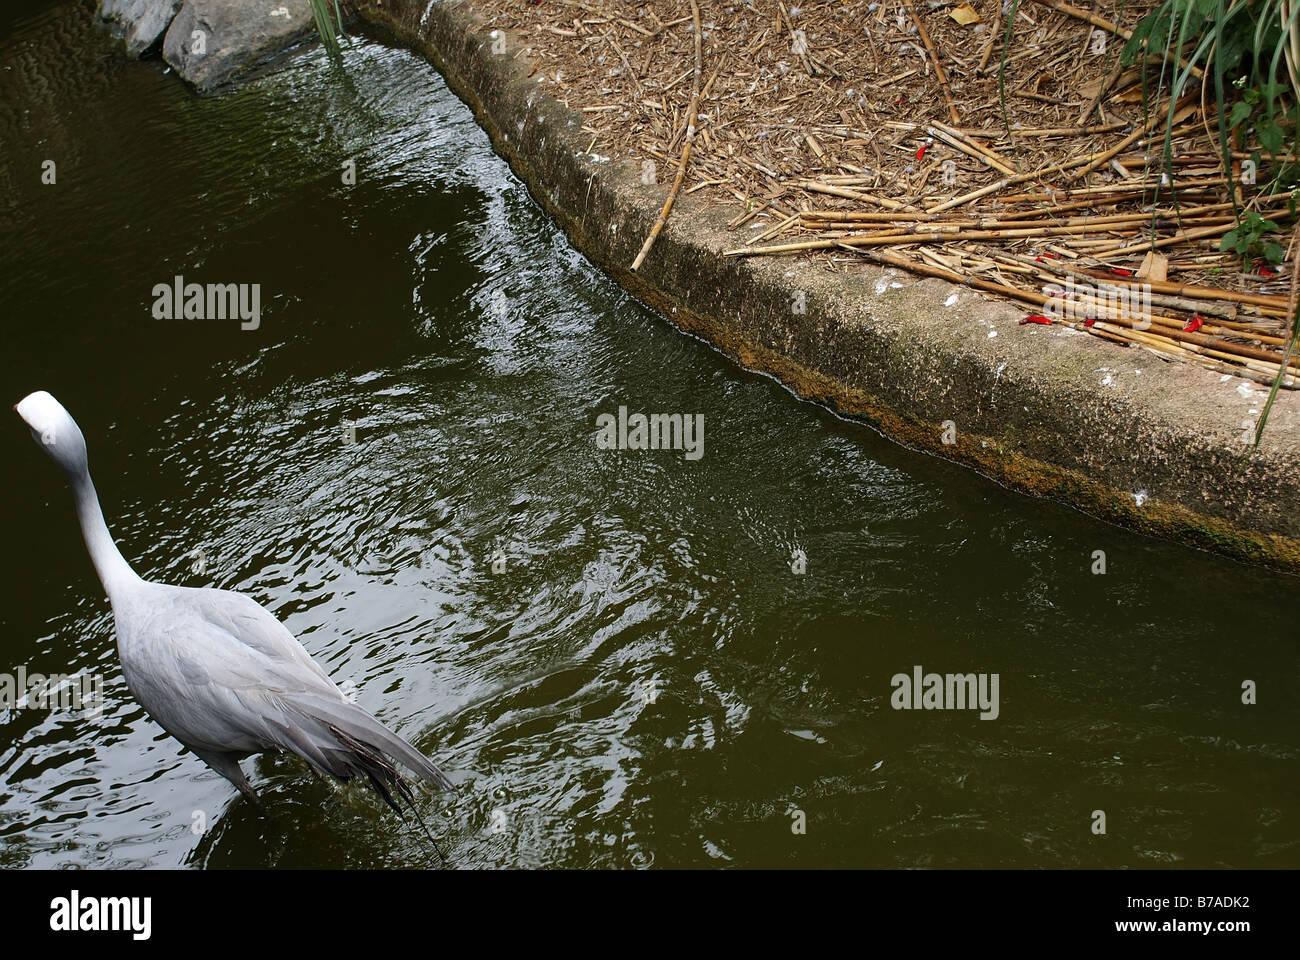 A Duck-Like bird wading alone. - Stock Image